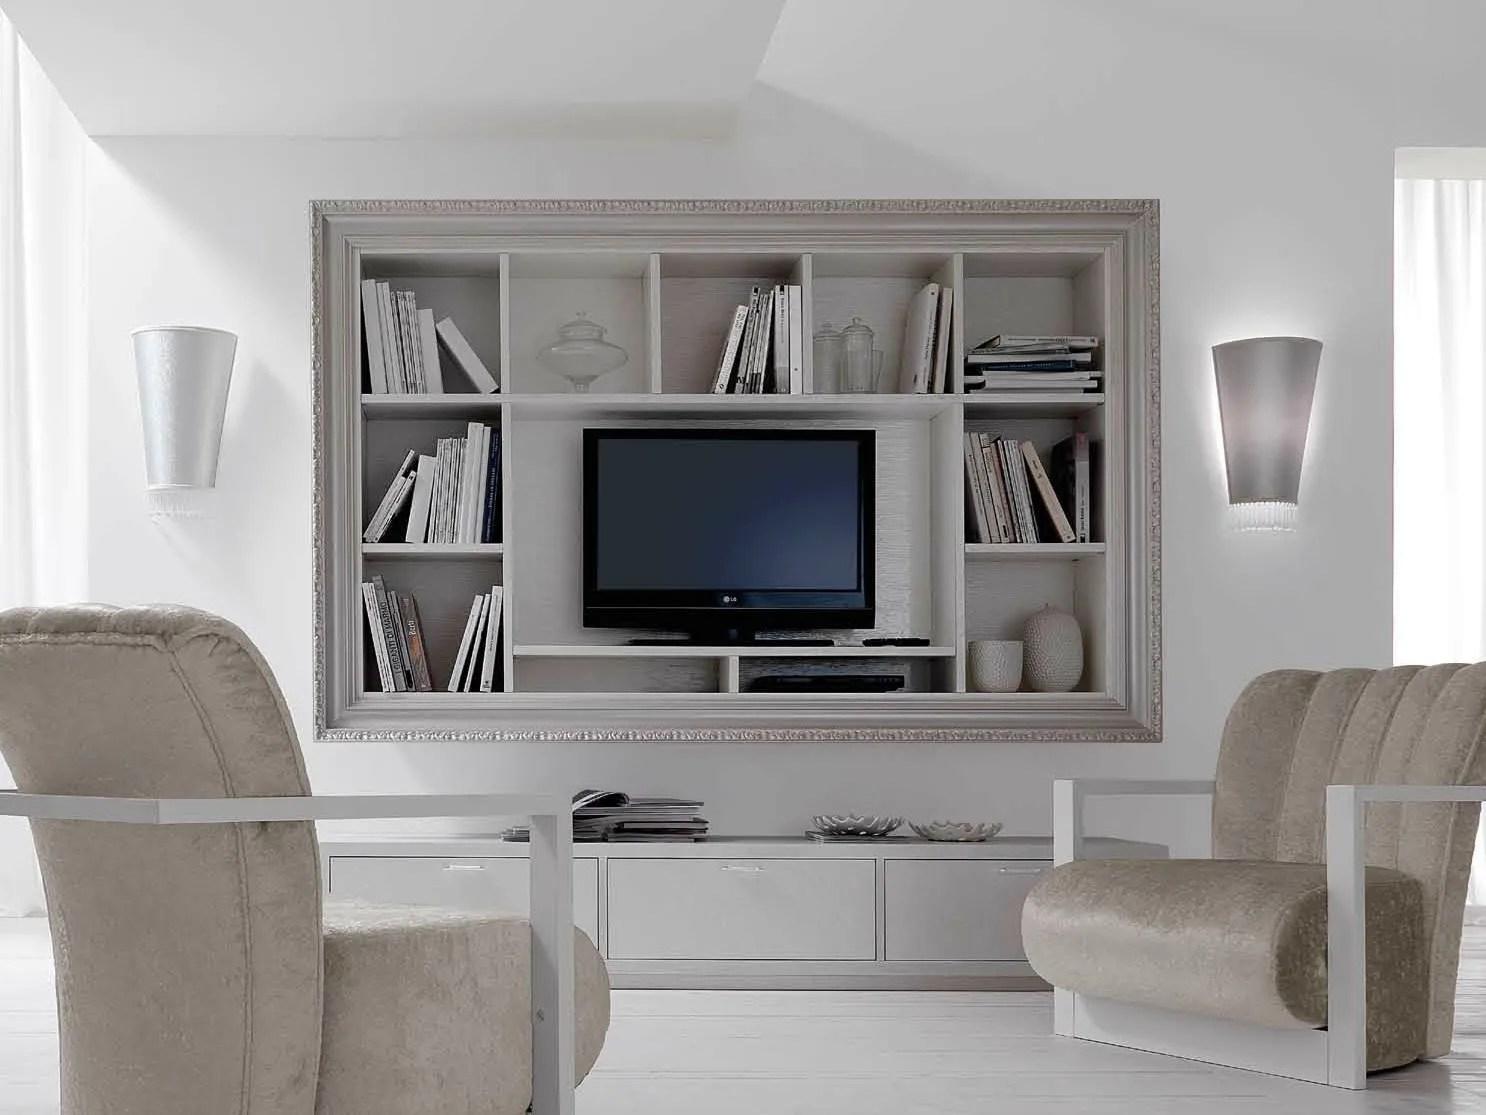 Wallmounted wooden TV cabinet with shelves GRETA By CorteZari